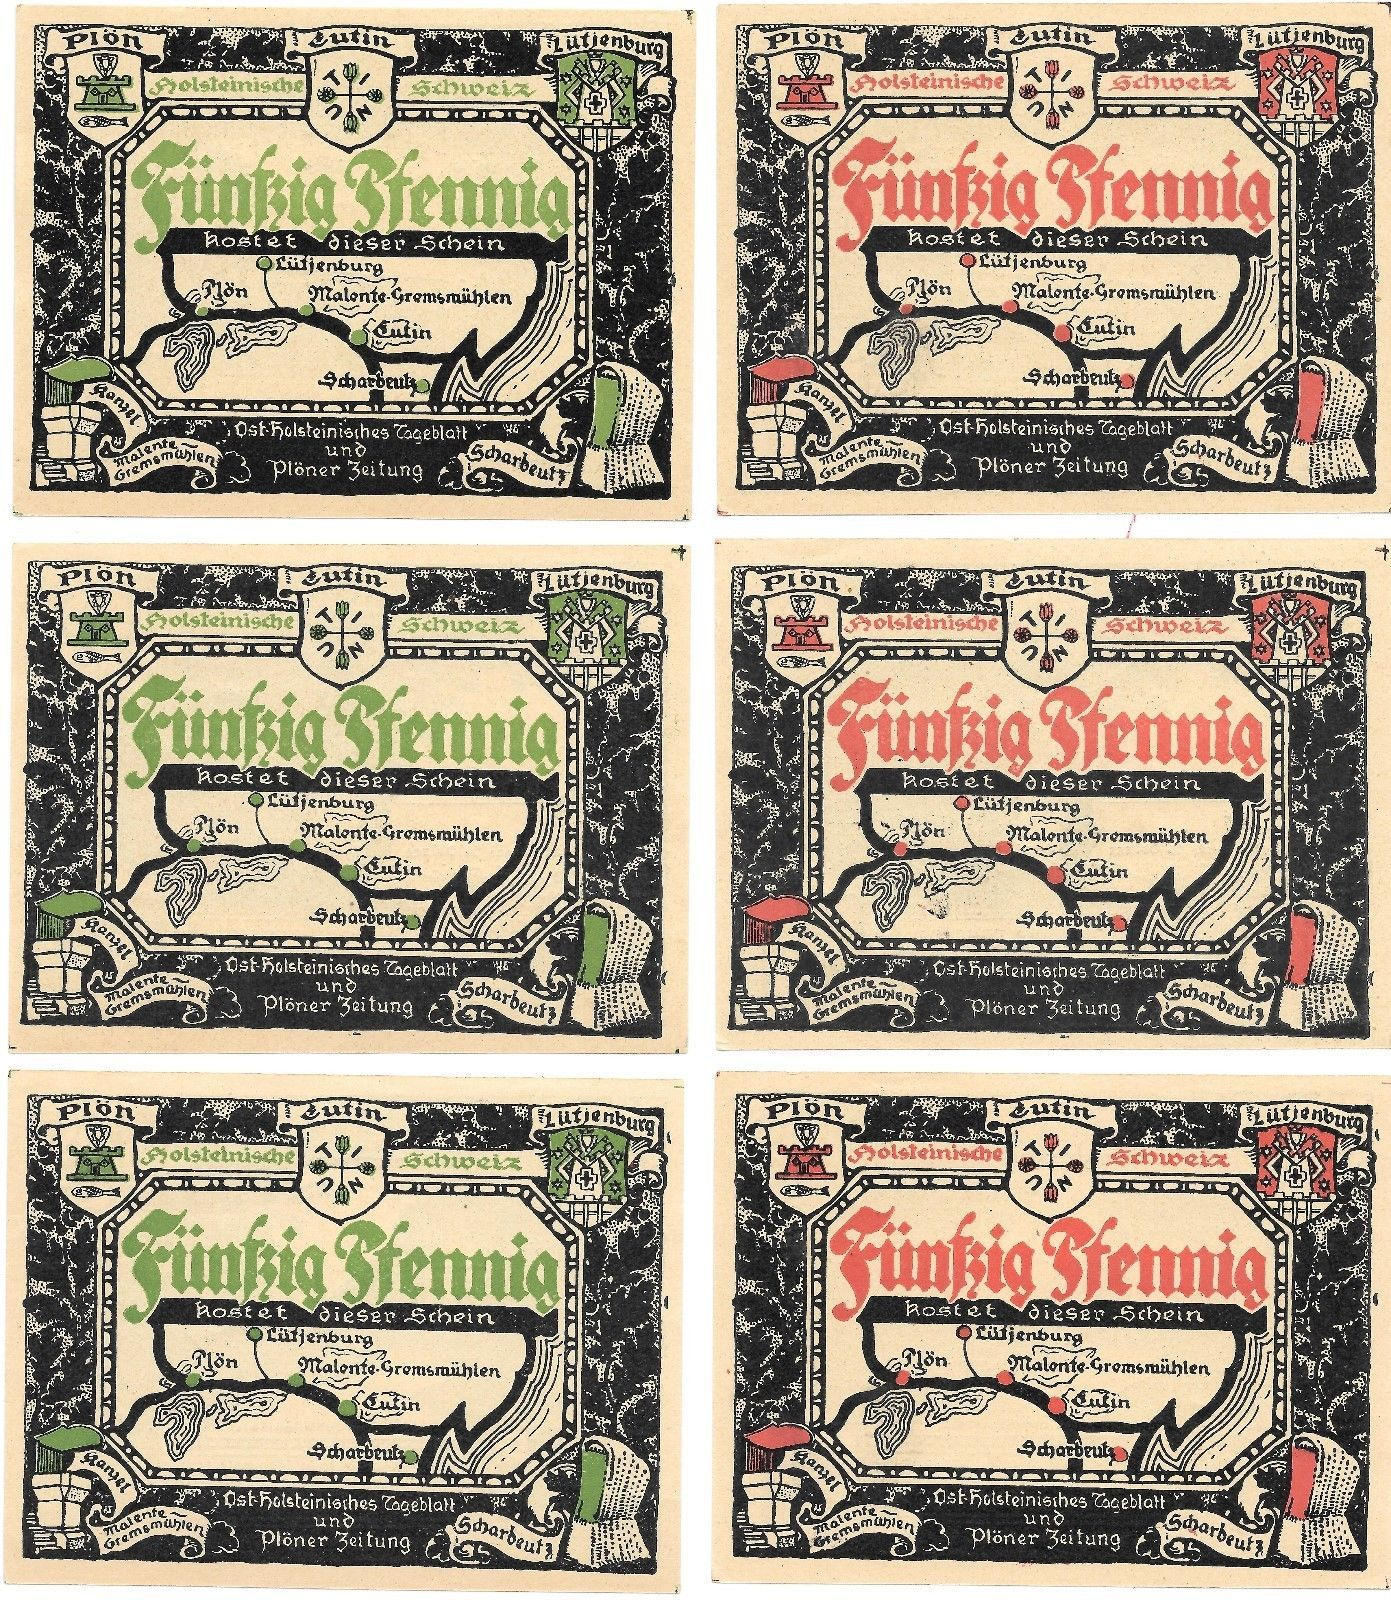 Germany 5 Towns 10 Notes Notgeld Set Unc~Eutin~Plon~Lutienburg~Scharbeutz~More~ - $17.92